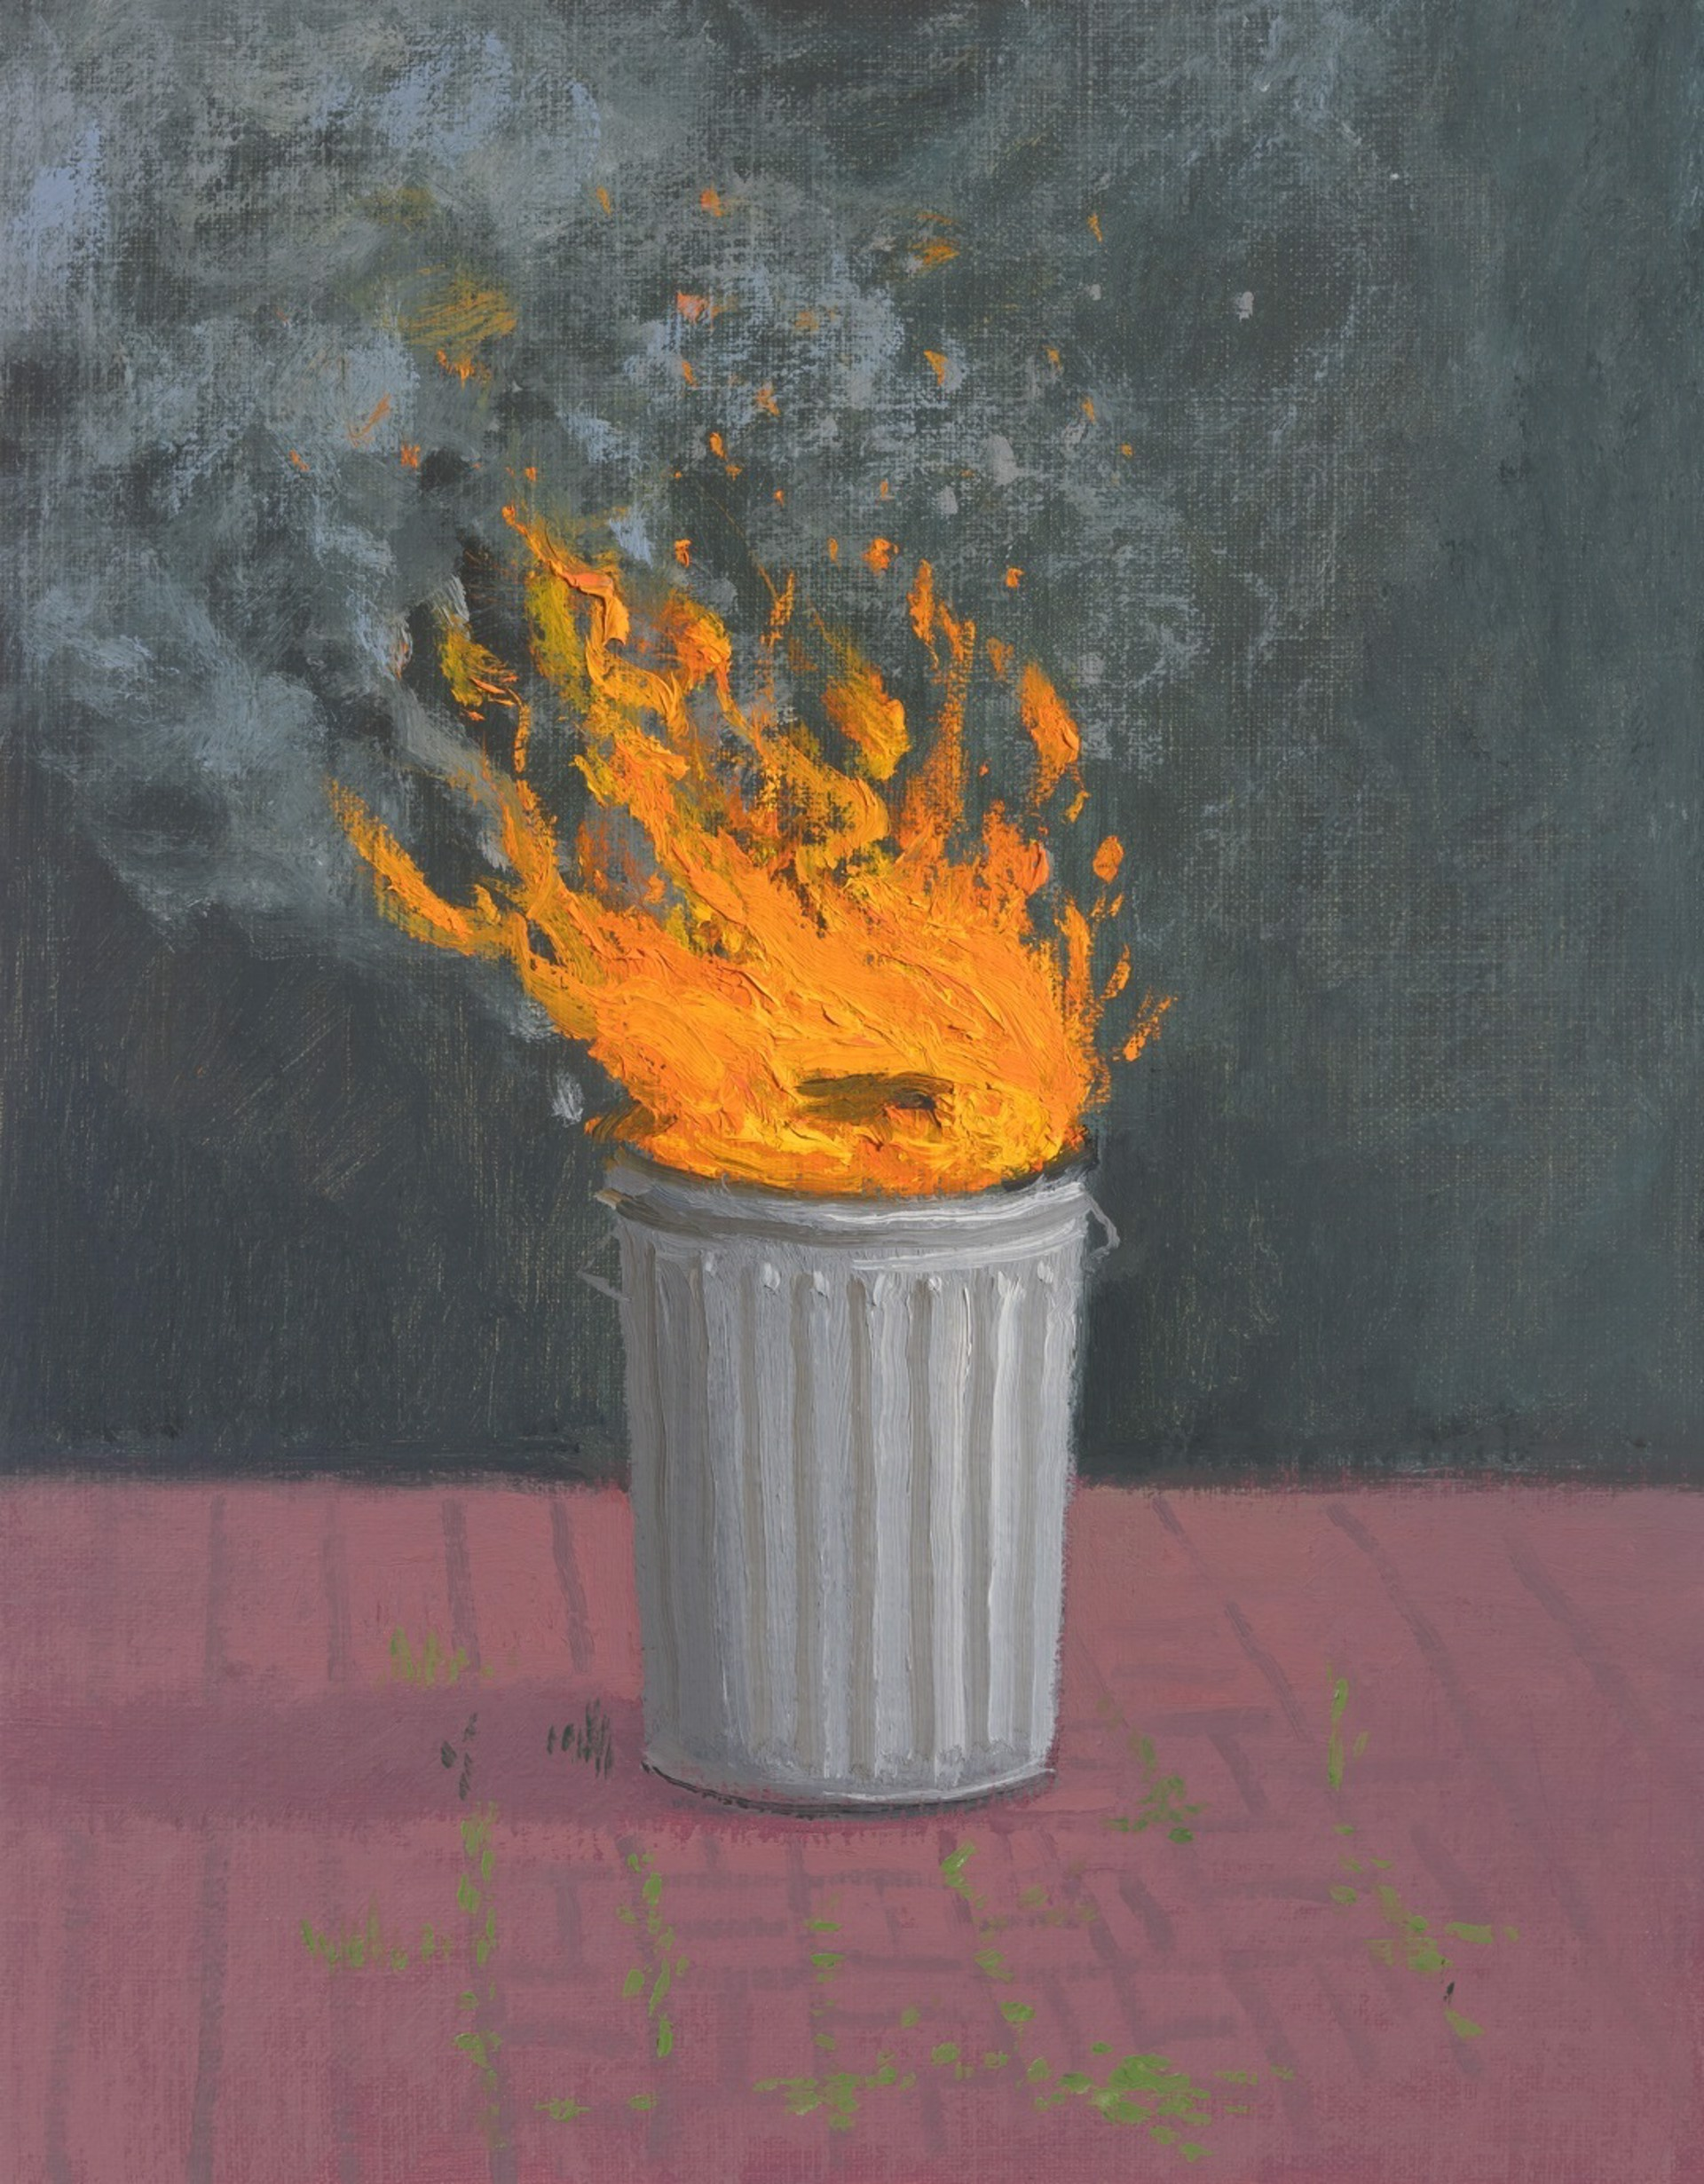 Trashfire IV by Vonn Cummings Sumner